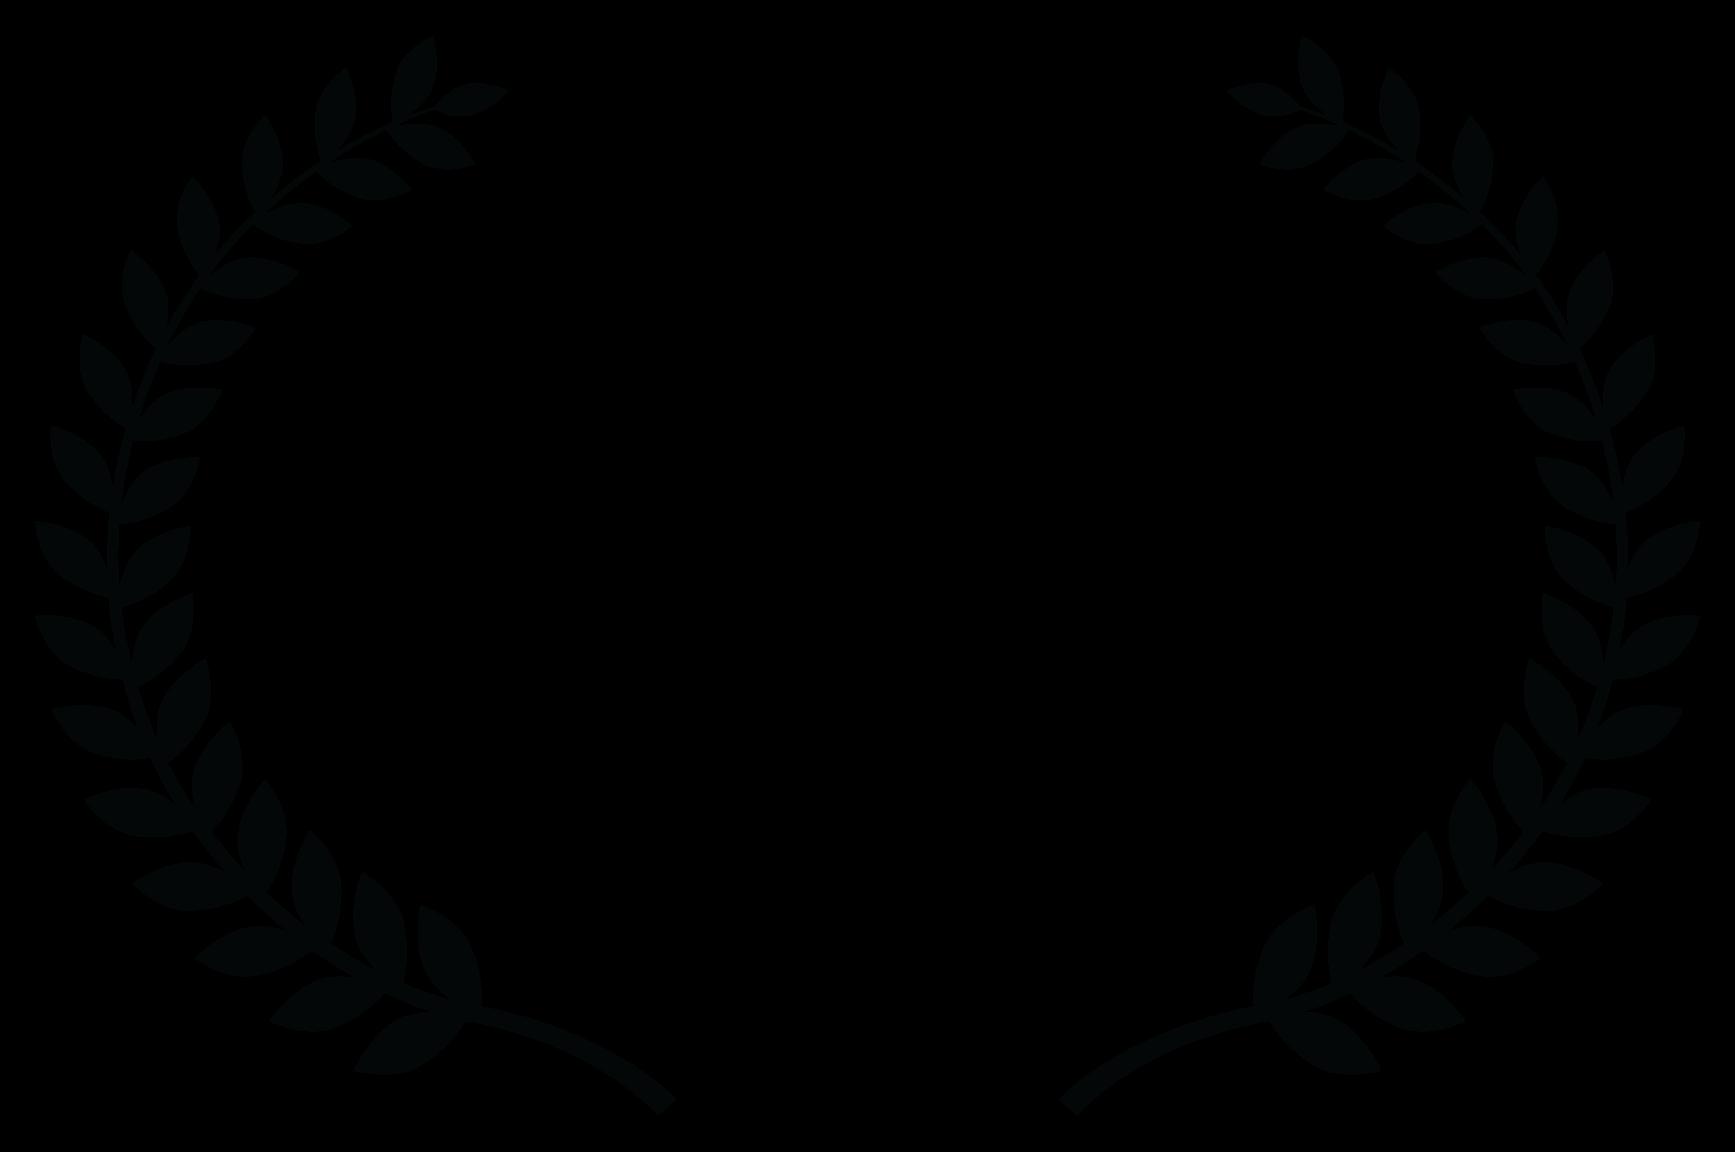 OFFICIAL SELECTION - Heartland International Film Festival - 2021